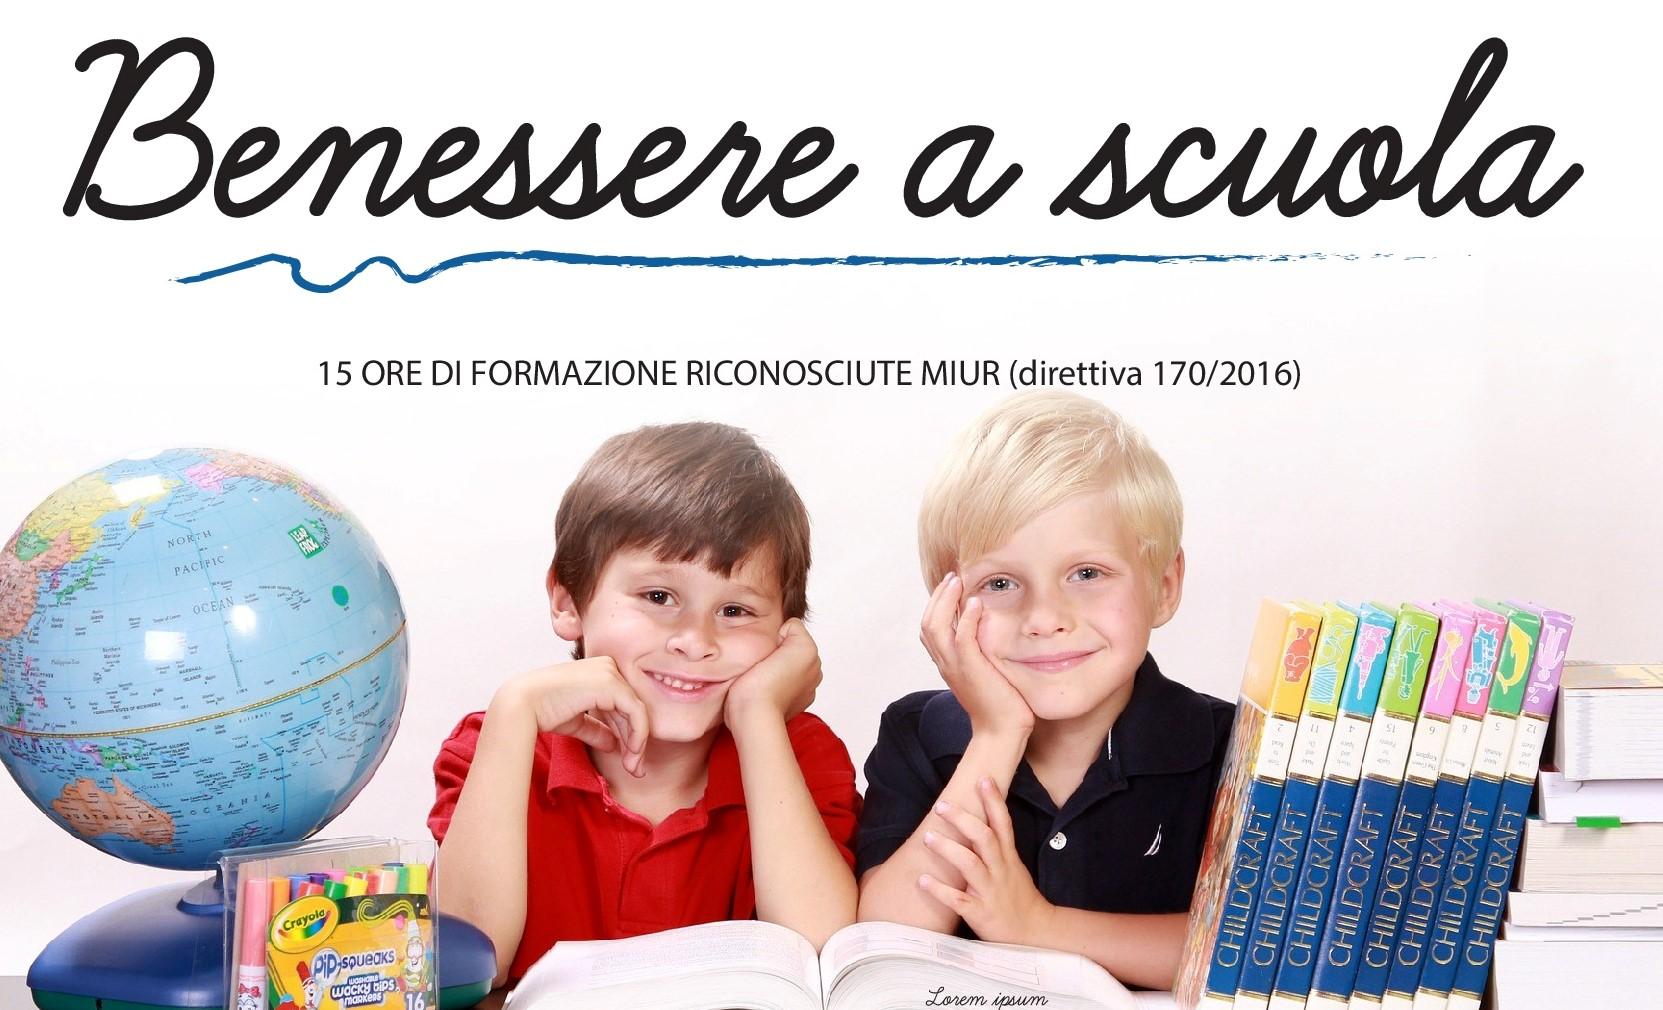 benessereascuola-001